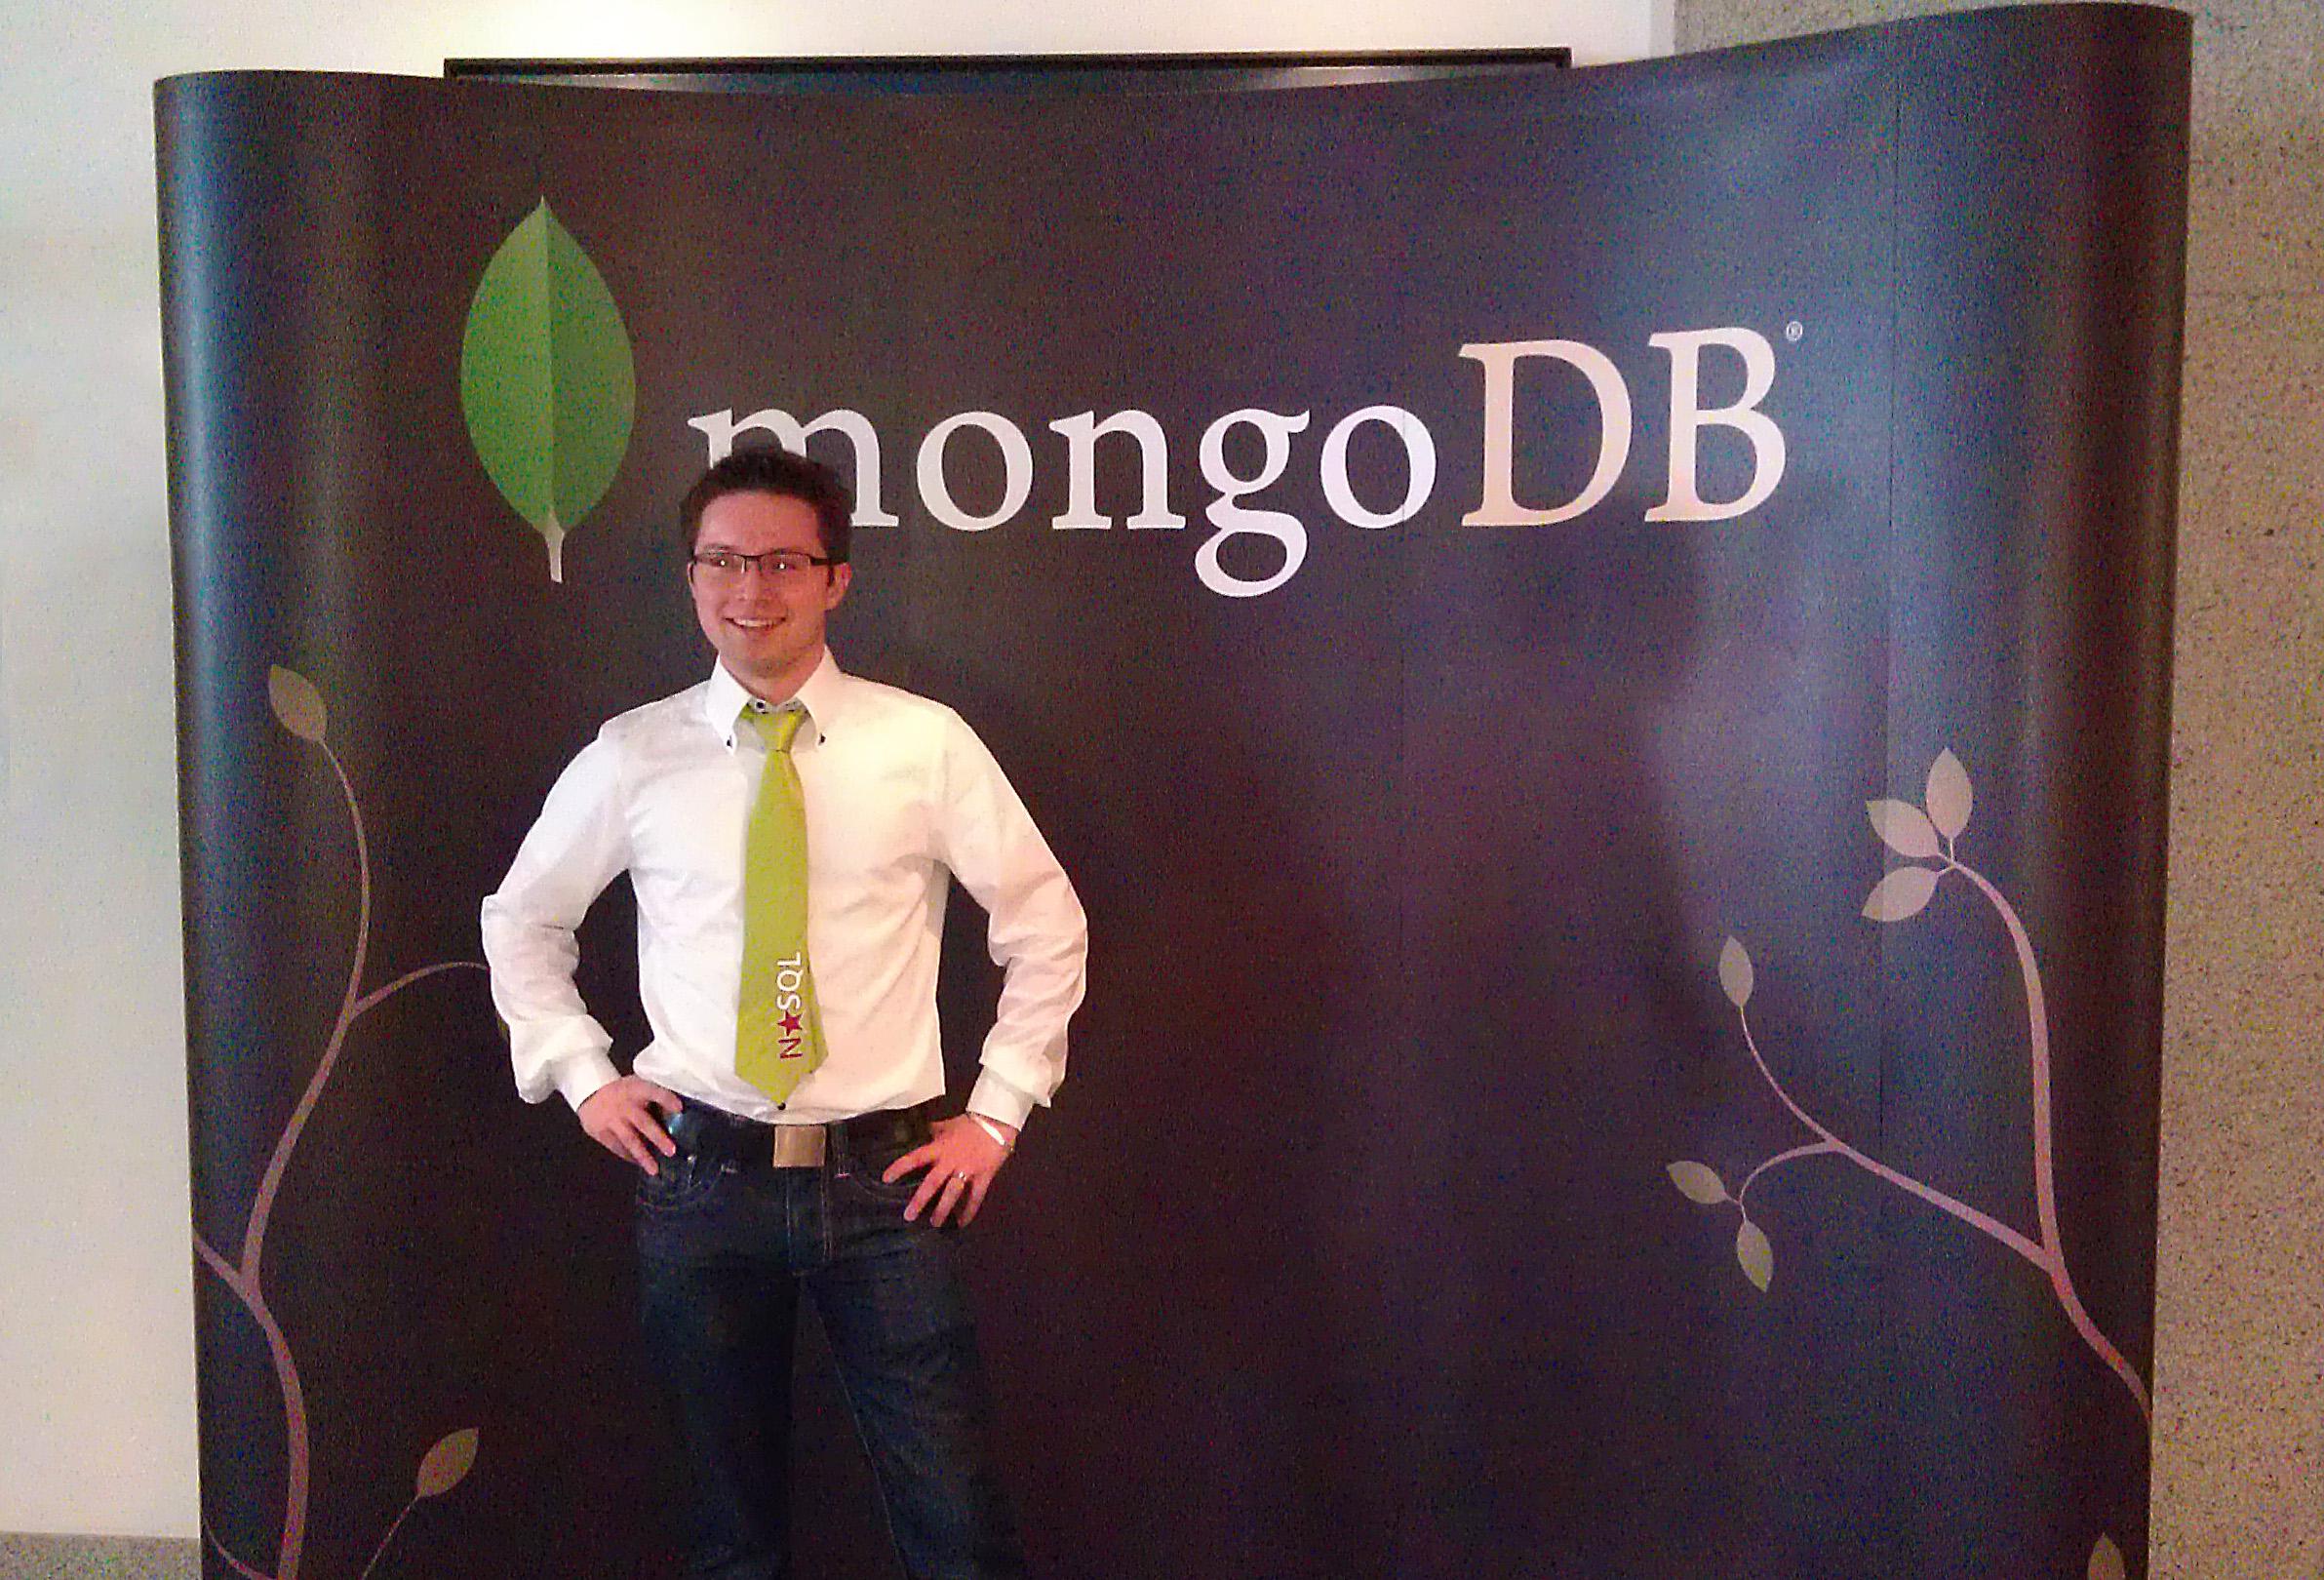 Johannes at MongoDB Berlin 2012